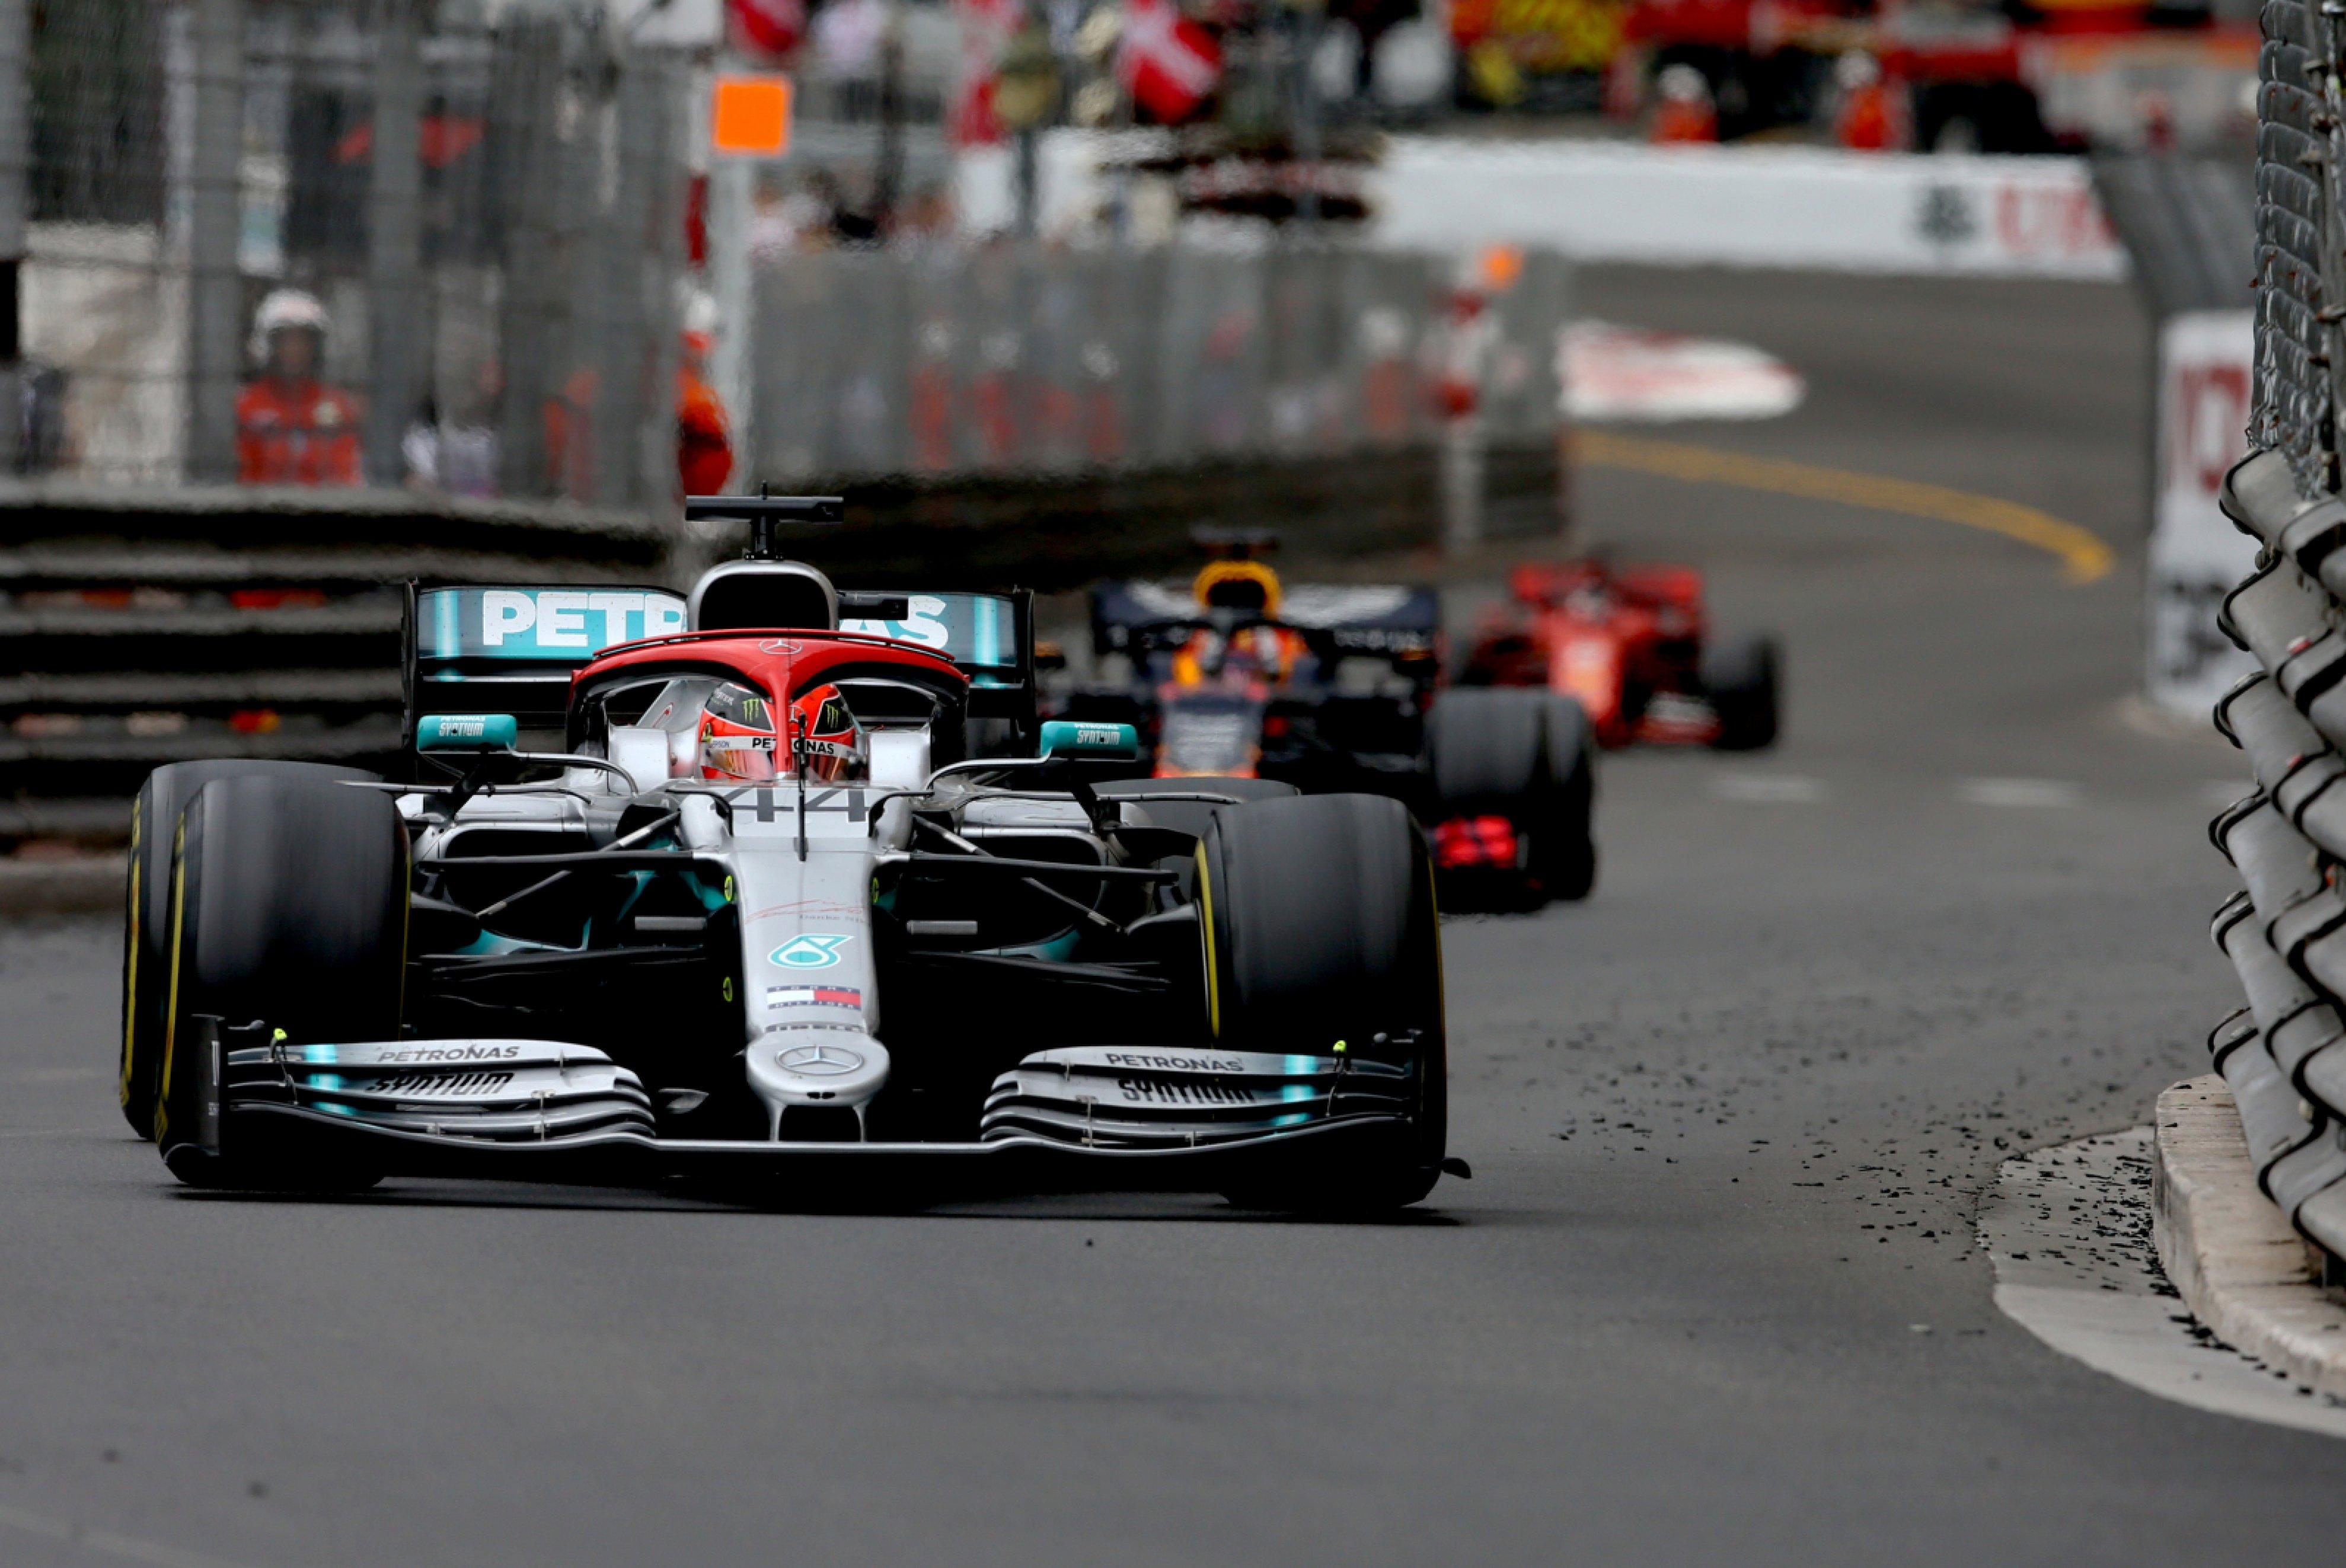 F1 Canadian Grand Prix: Start Time, TV Channel, Live Stream